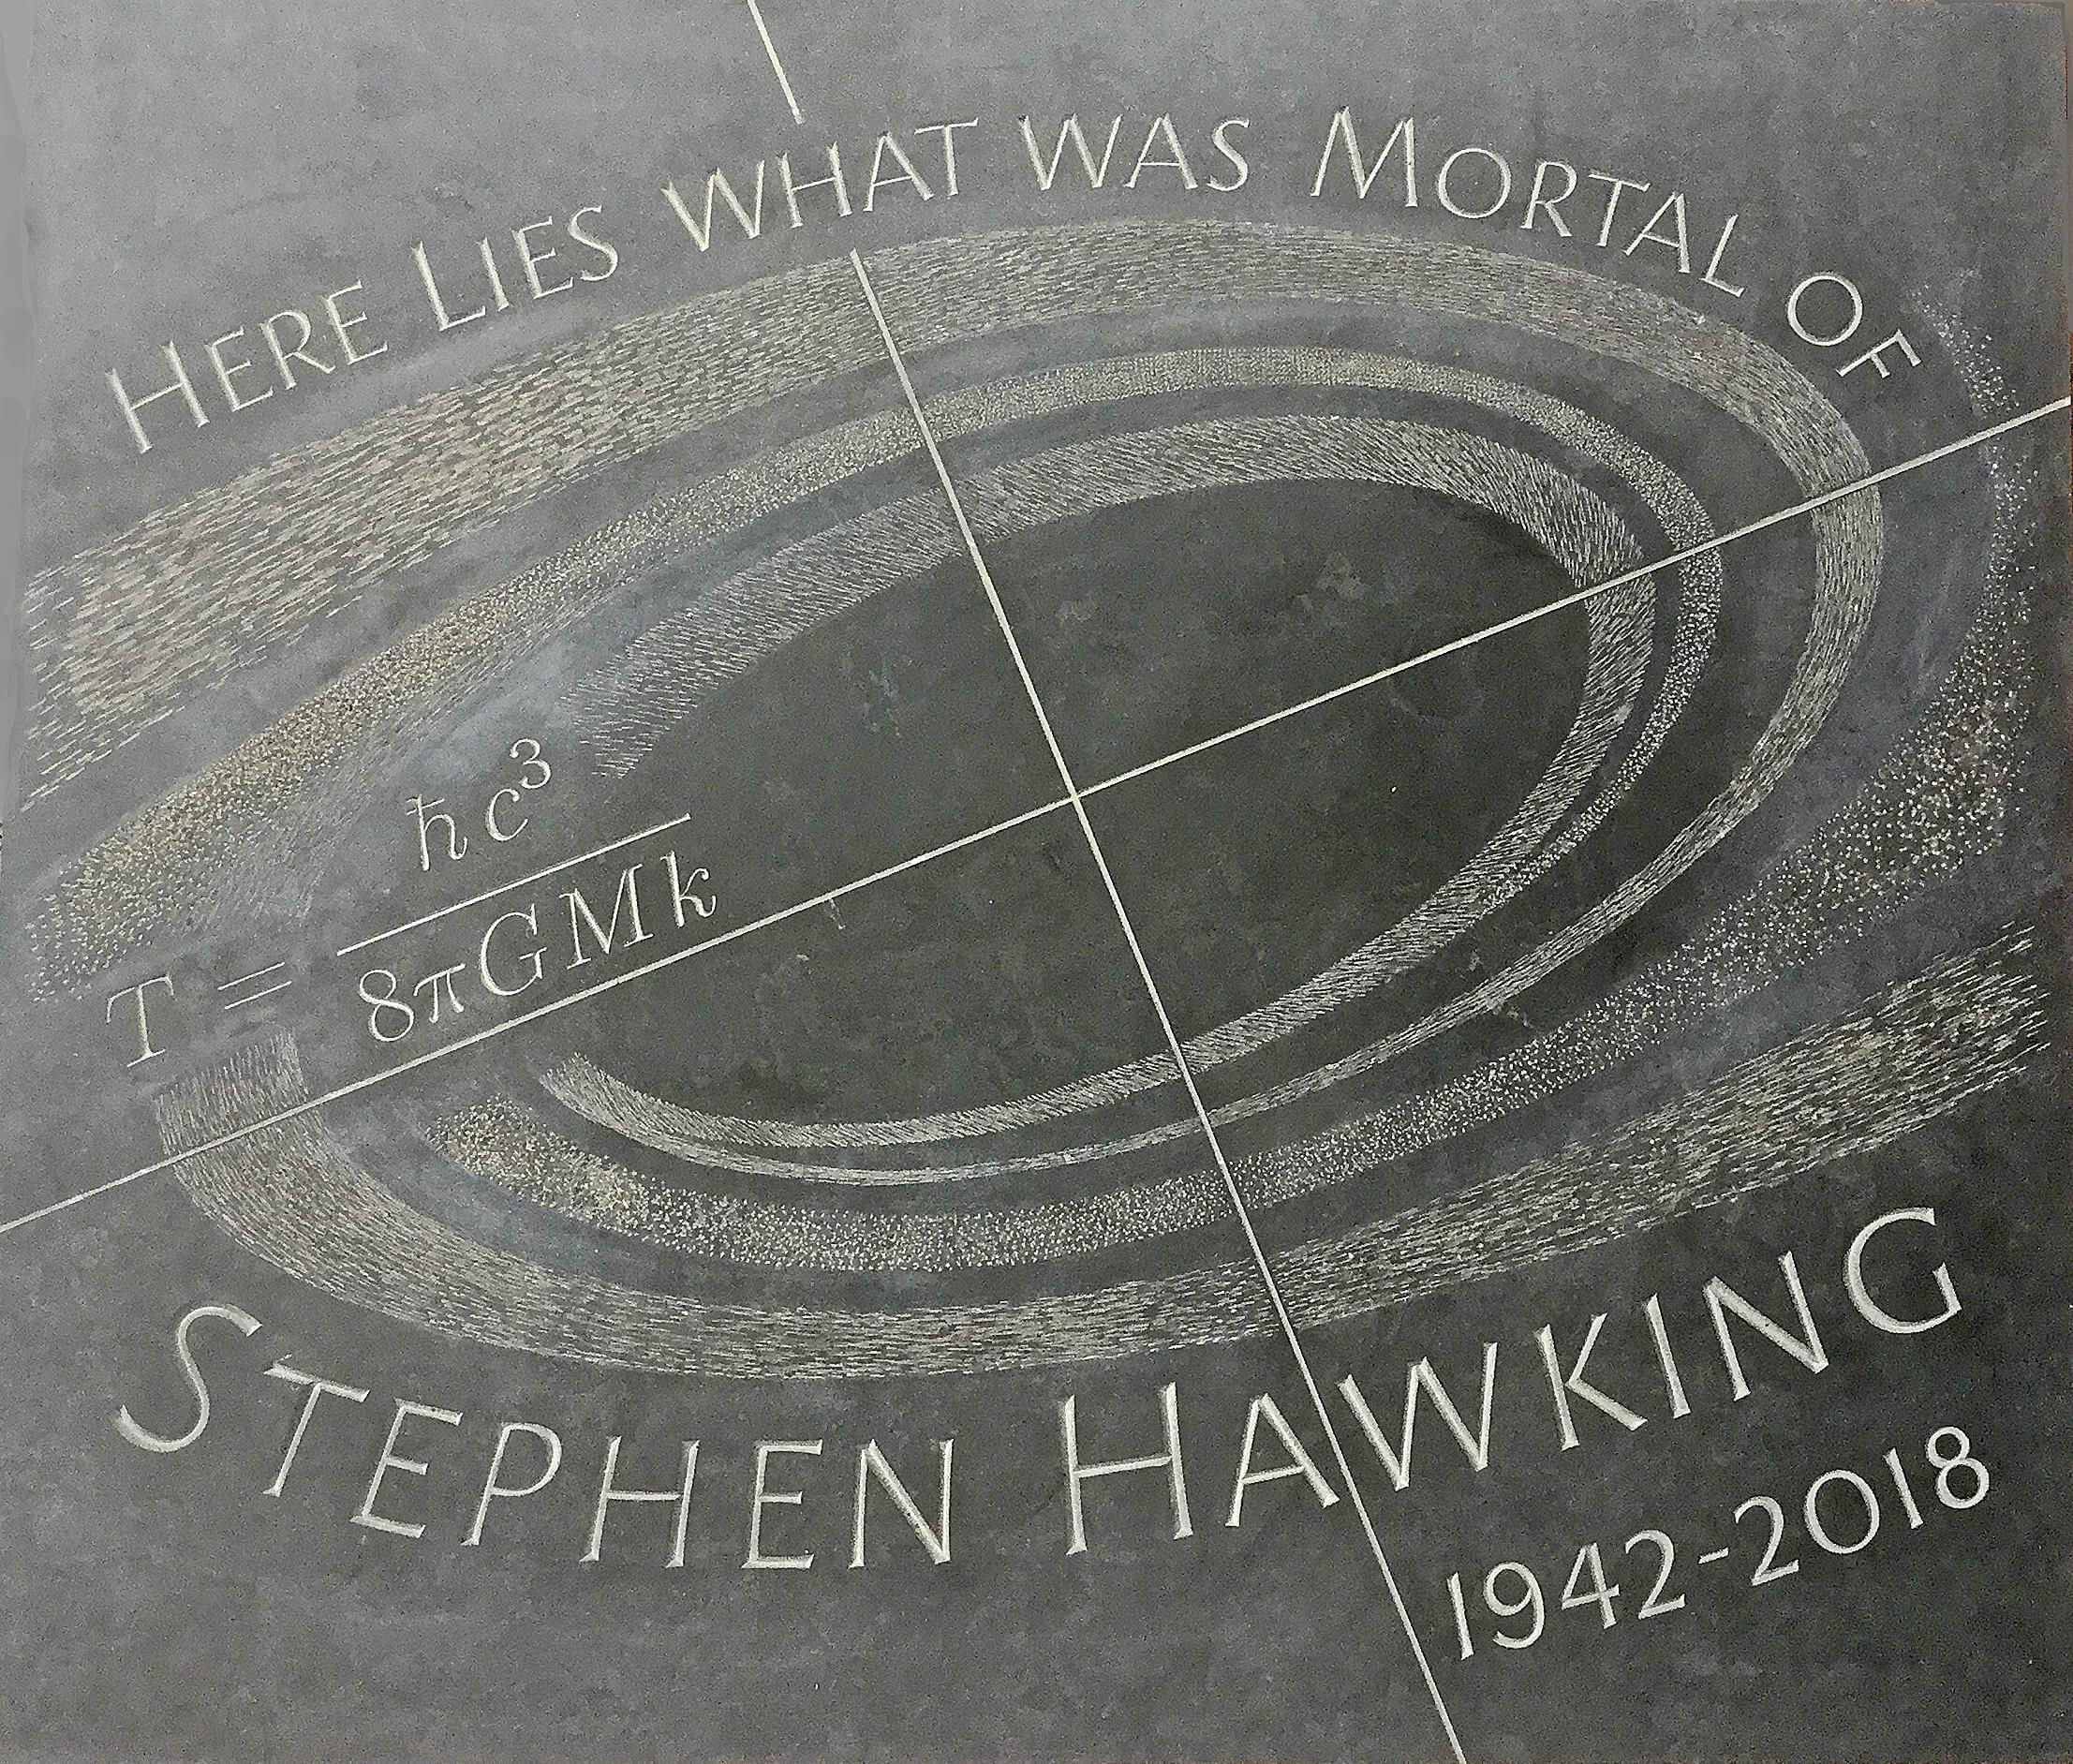 Hawking_DEANSYARDLO.jpg